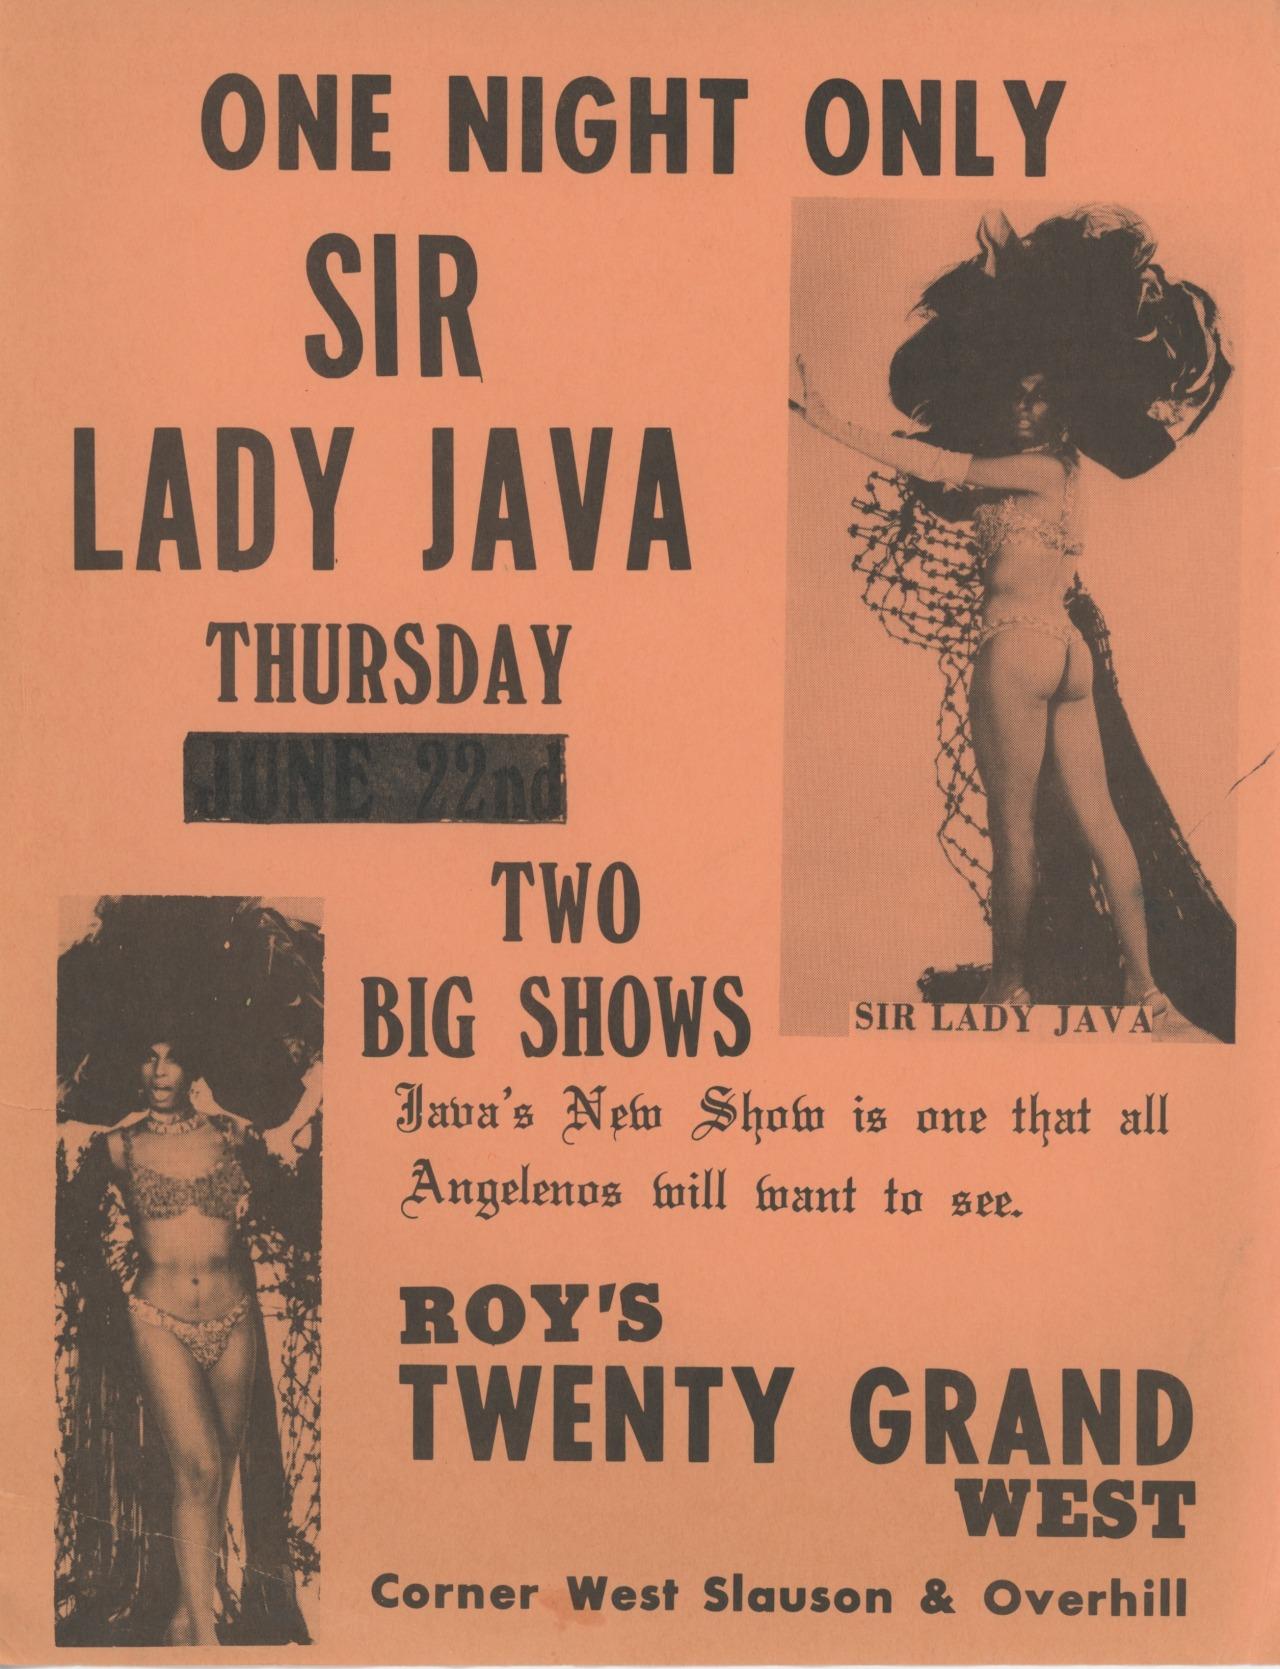 Sir Lady Java at Roy's Twenty Grand West, July 22, 1971